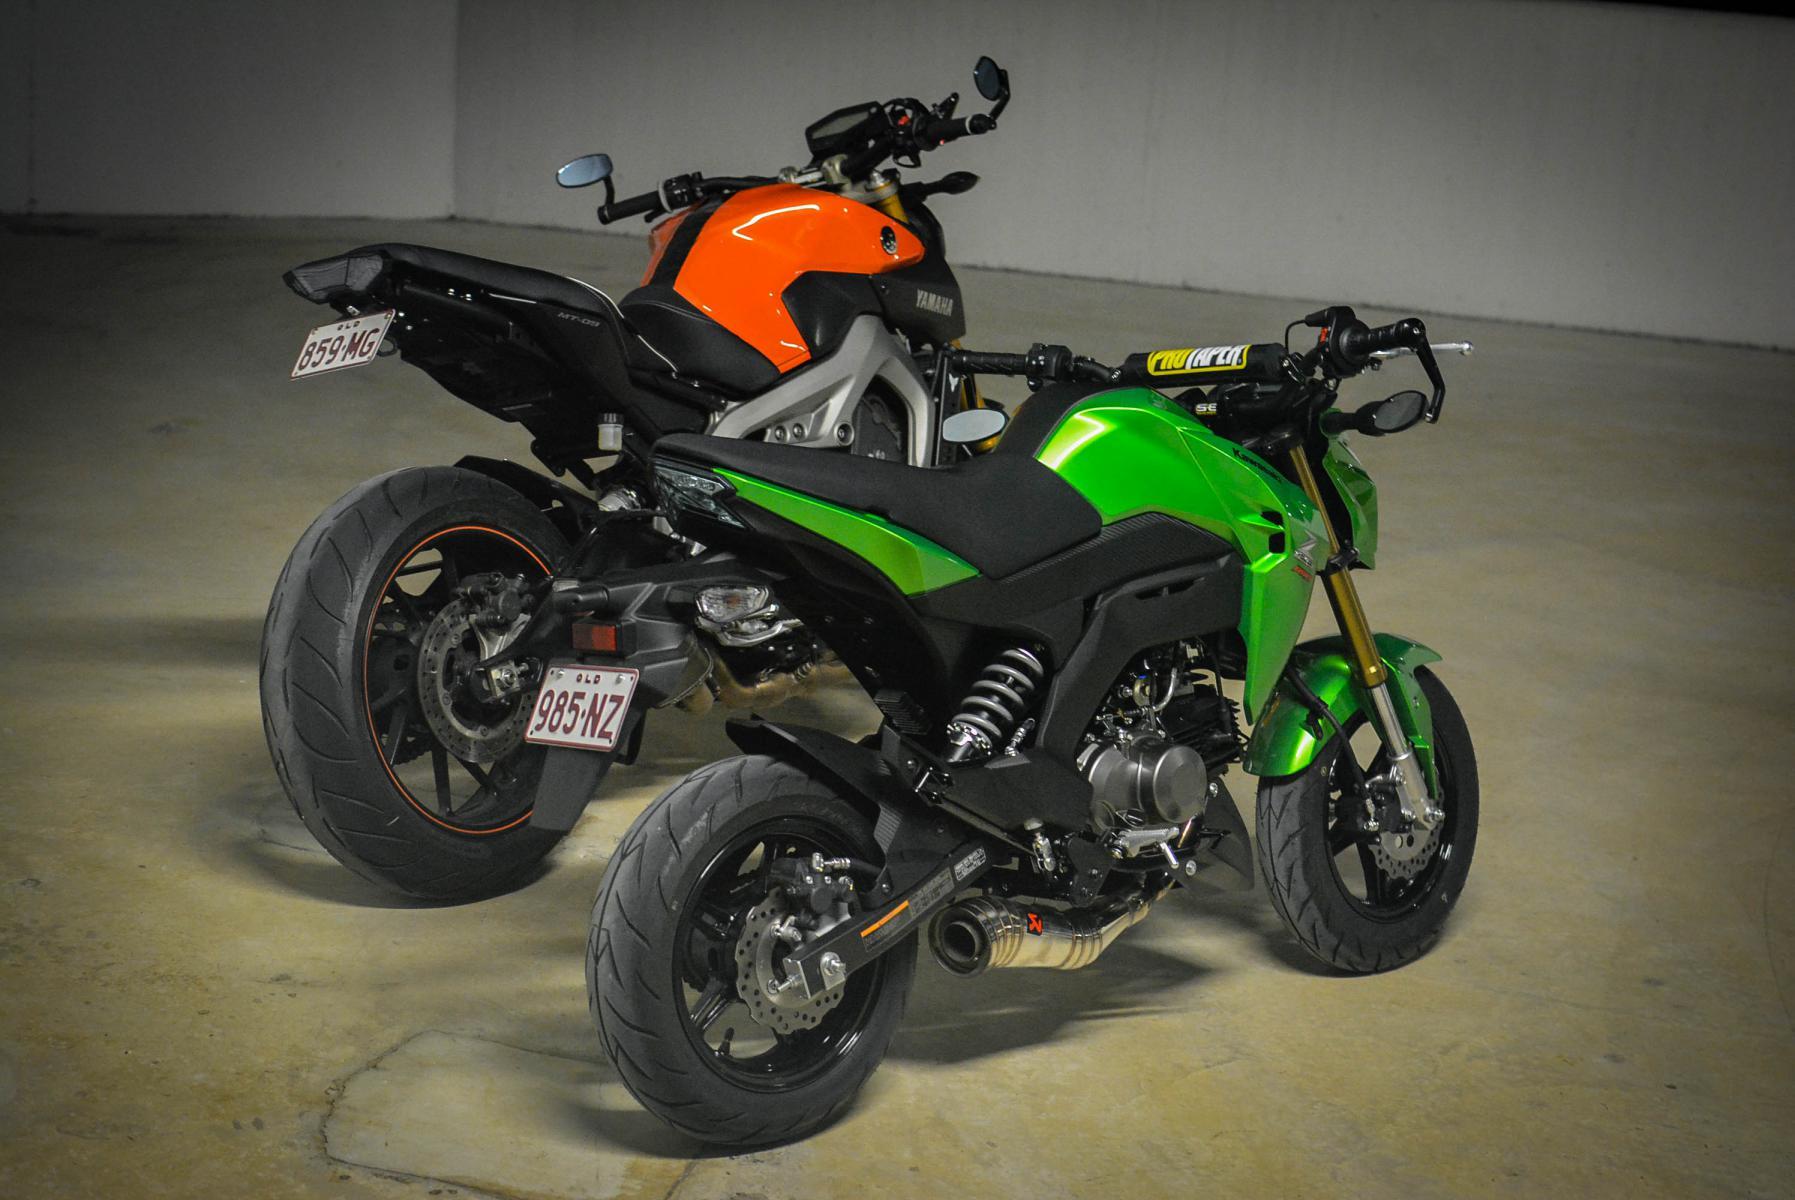 2017 Kawasaki Z125 Pro >> What Did You Do To Your Kawasaki Z125 Today? - Kawasaki Z125 Forum